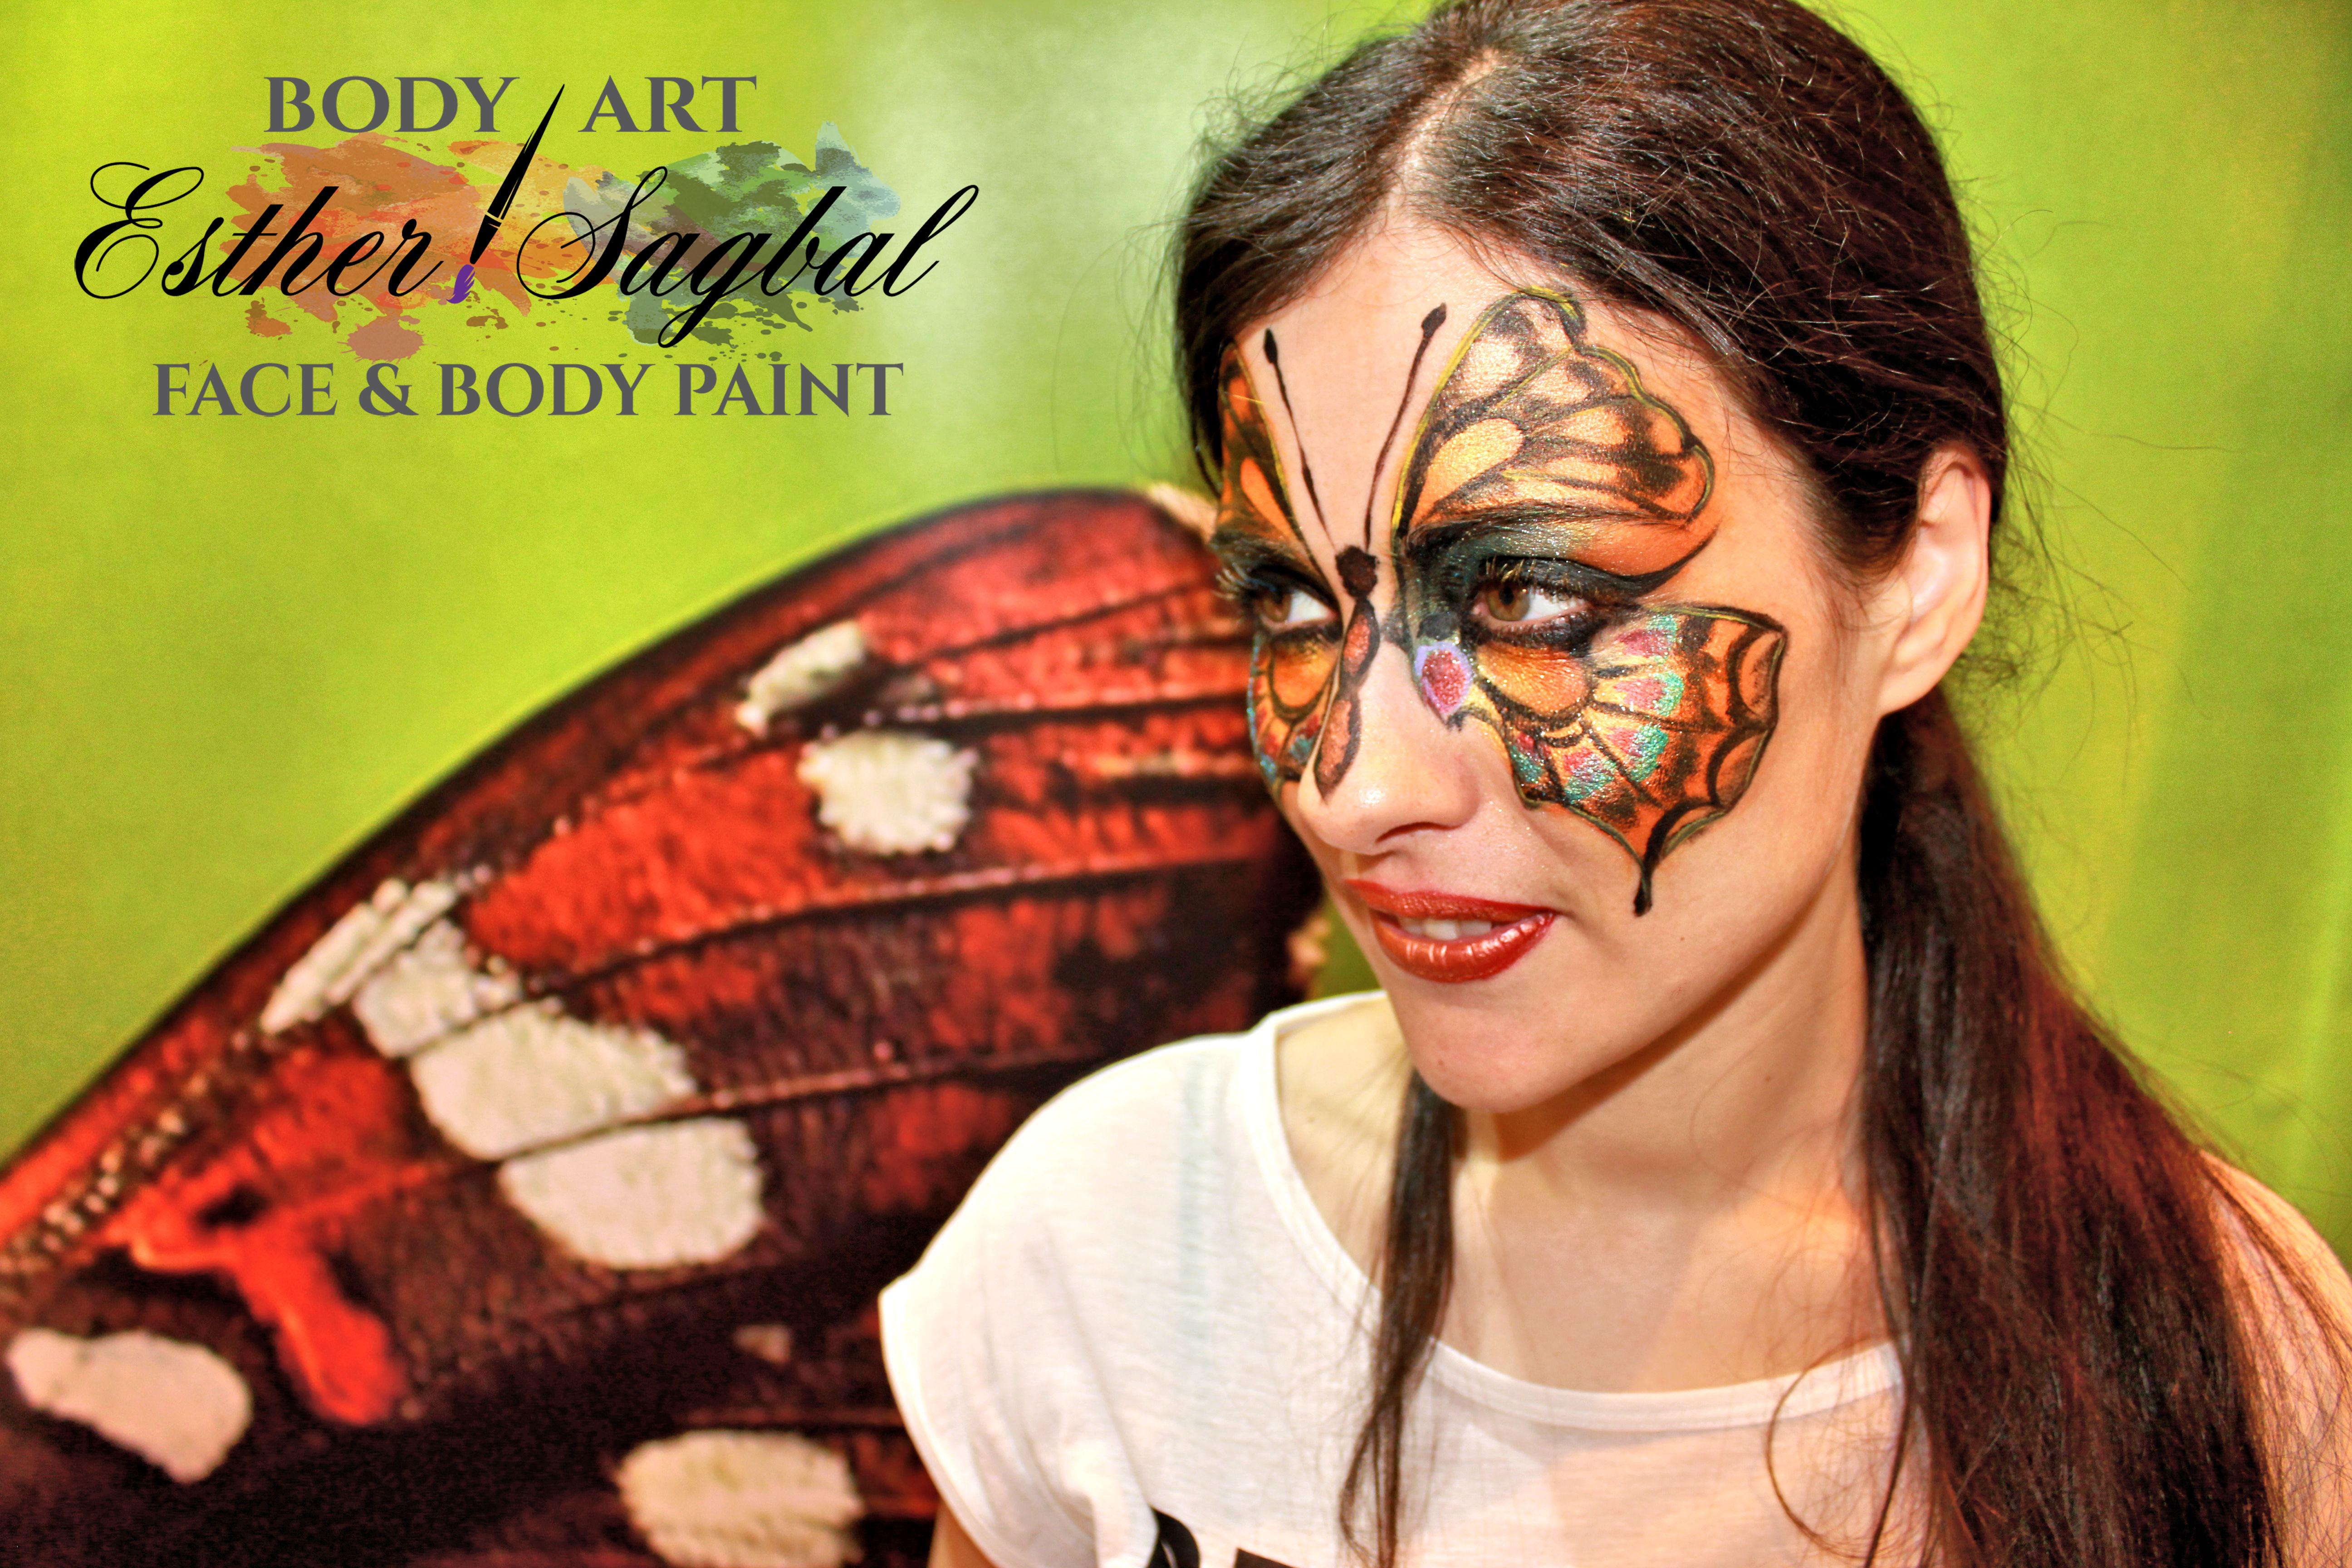 Bodypaint Madrid, pintura corporal fantasía, contratatar bodypaintet, maquillador bodypaint Madrid